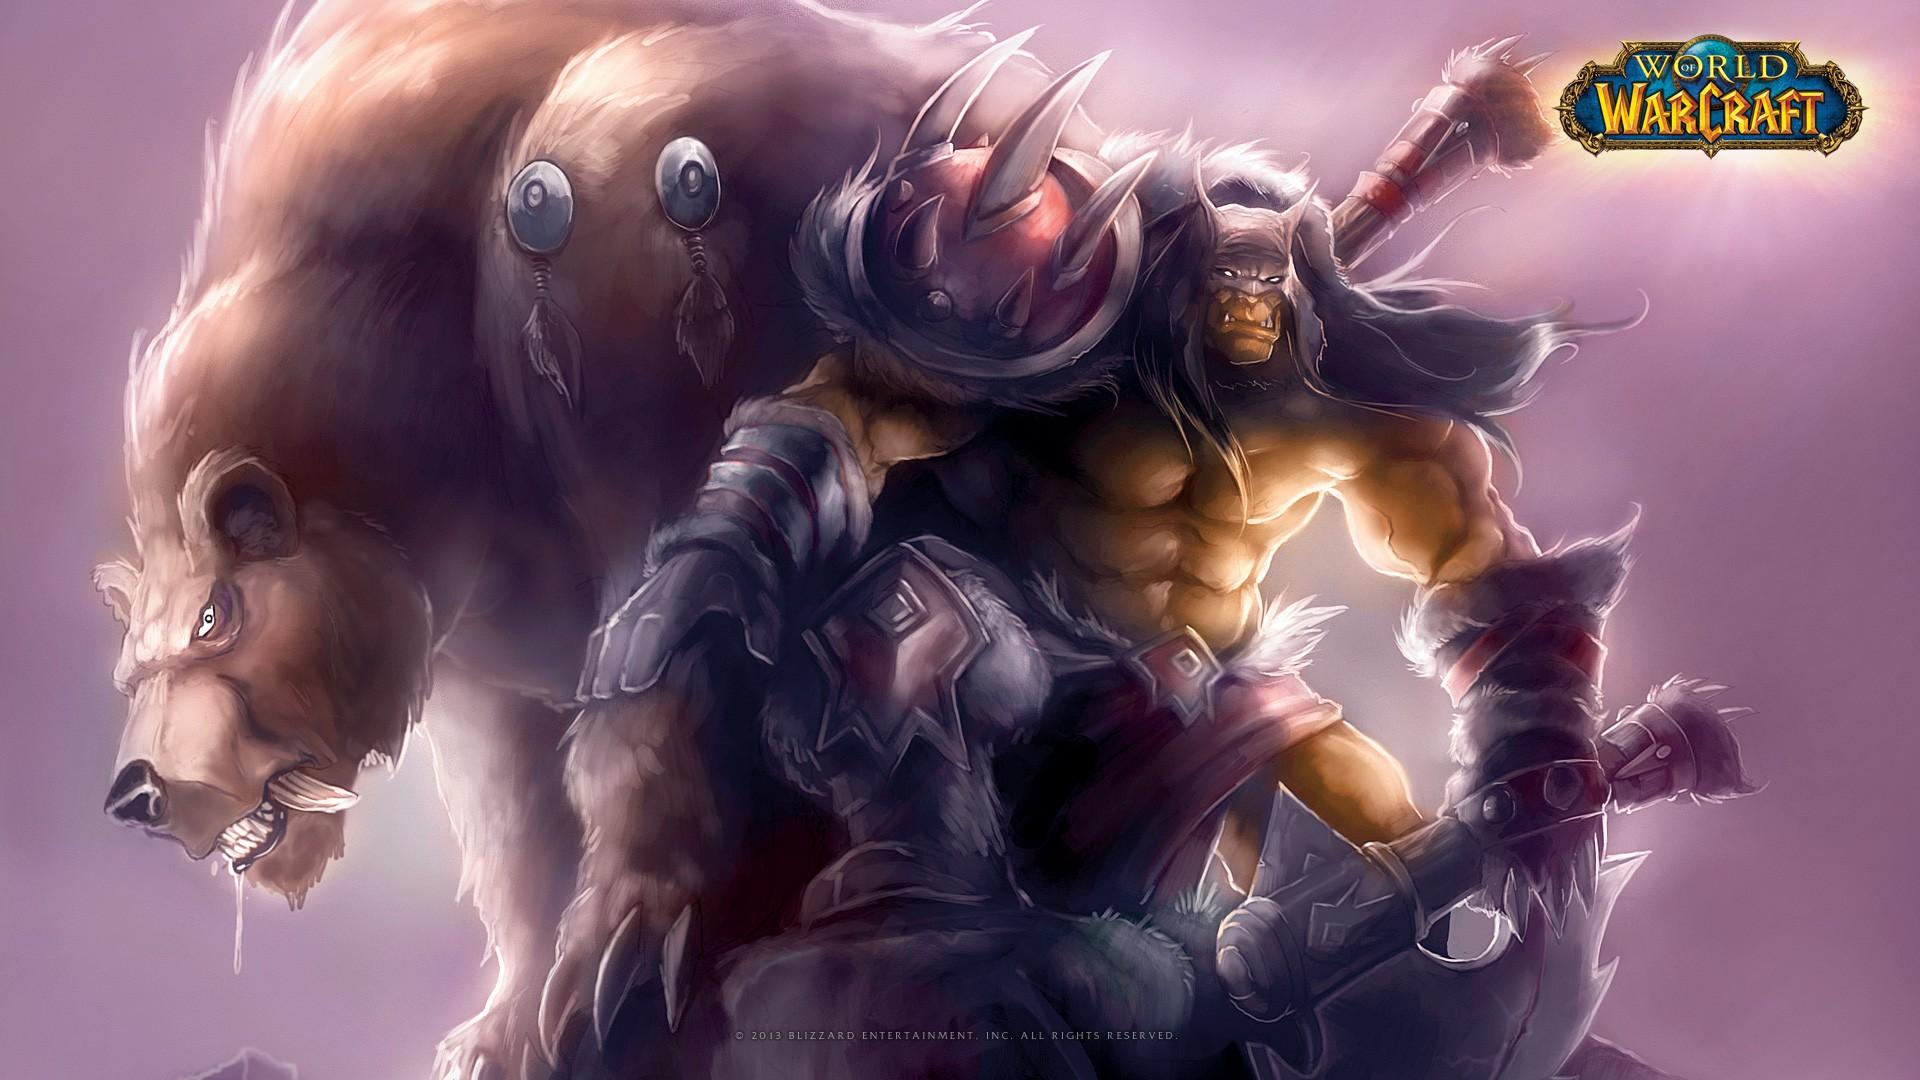 Wallpaper Illustration Video Games World Of Warcraft Comics